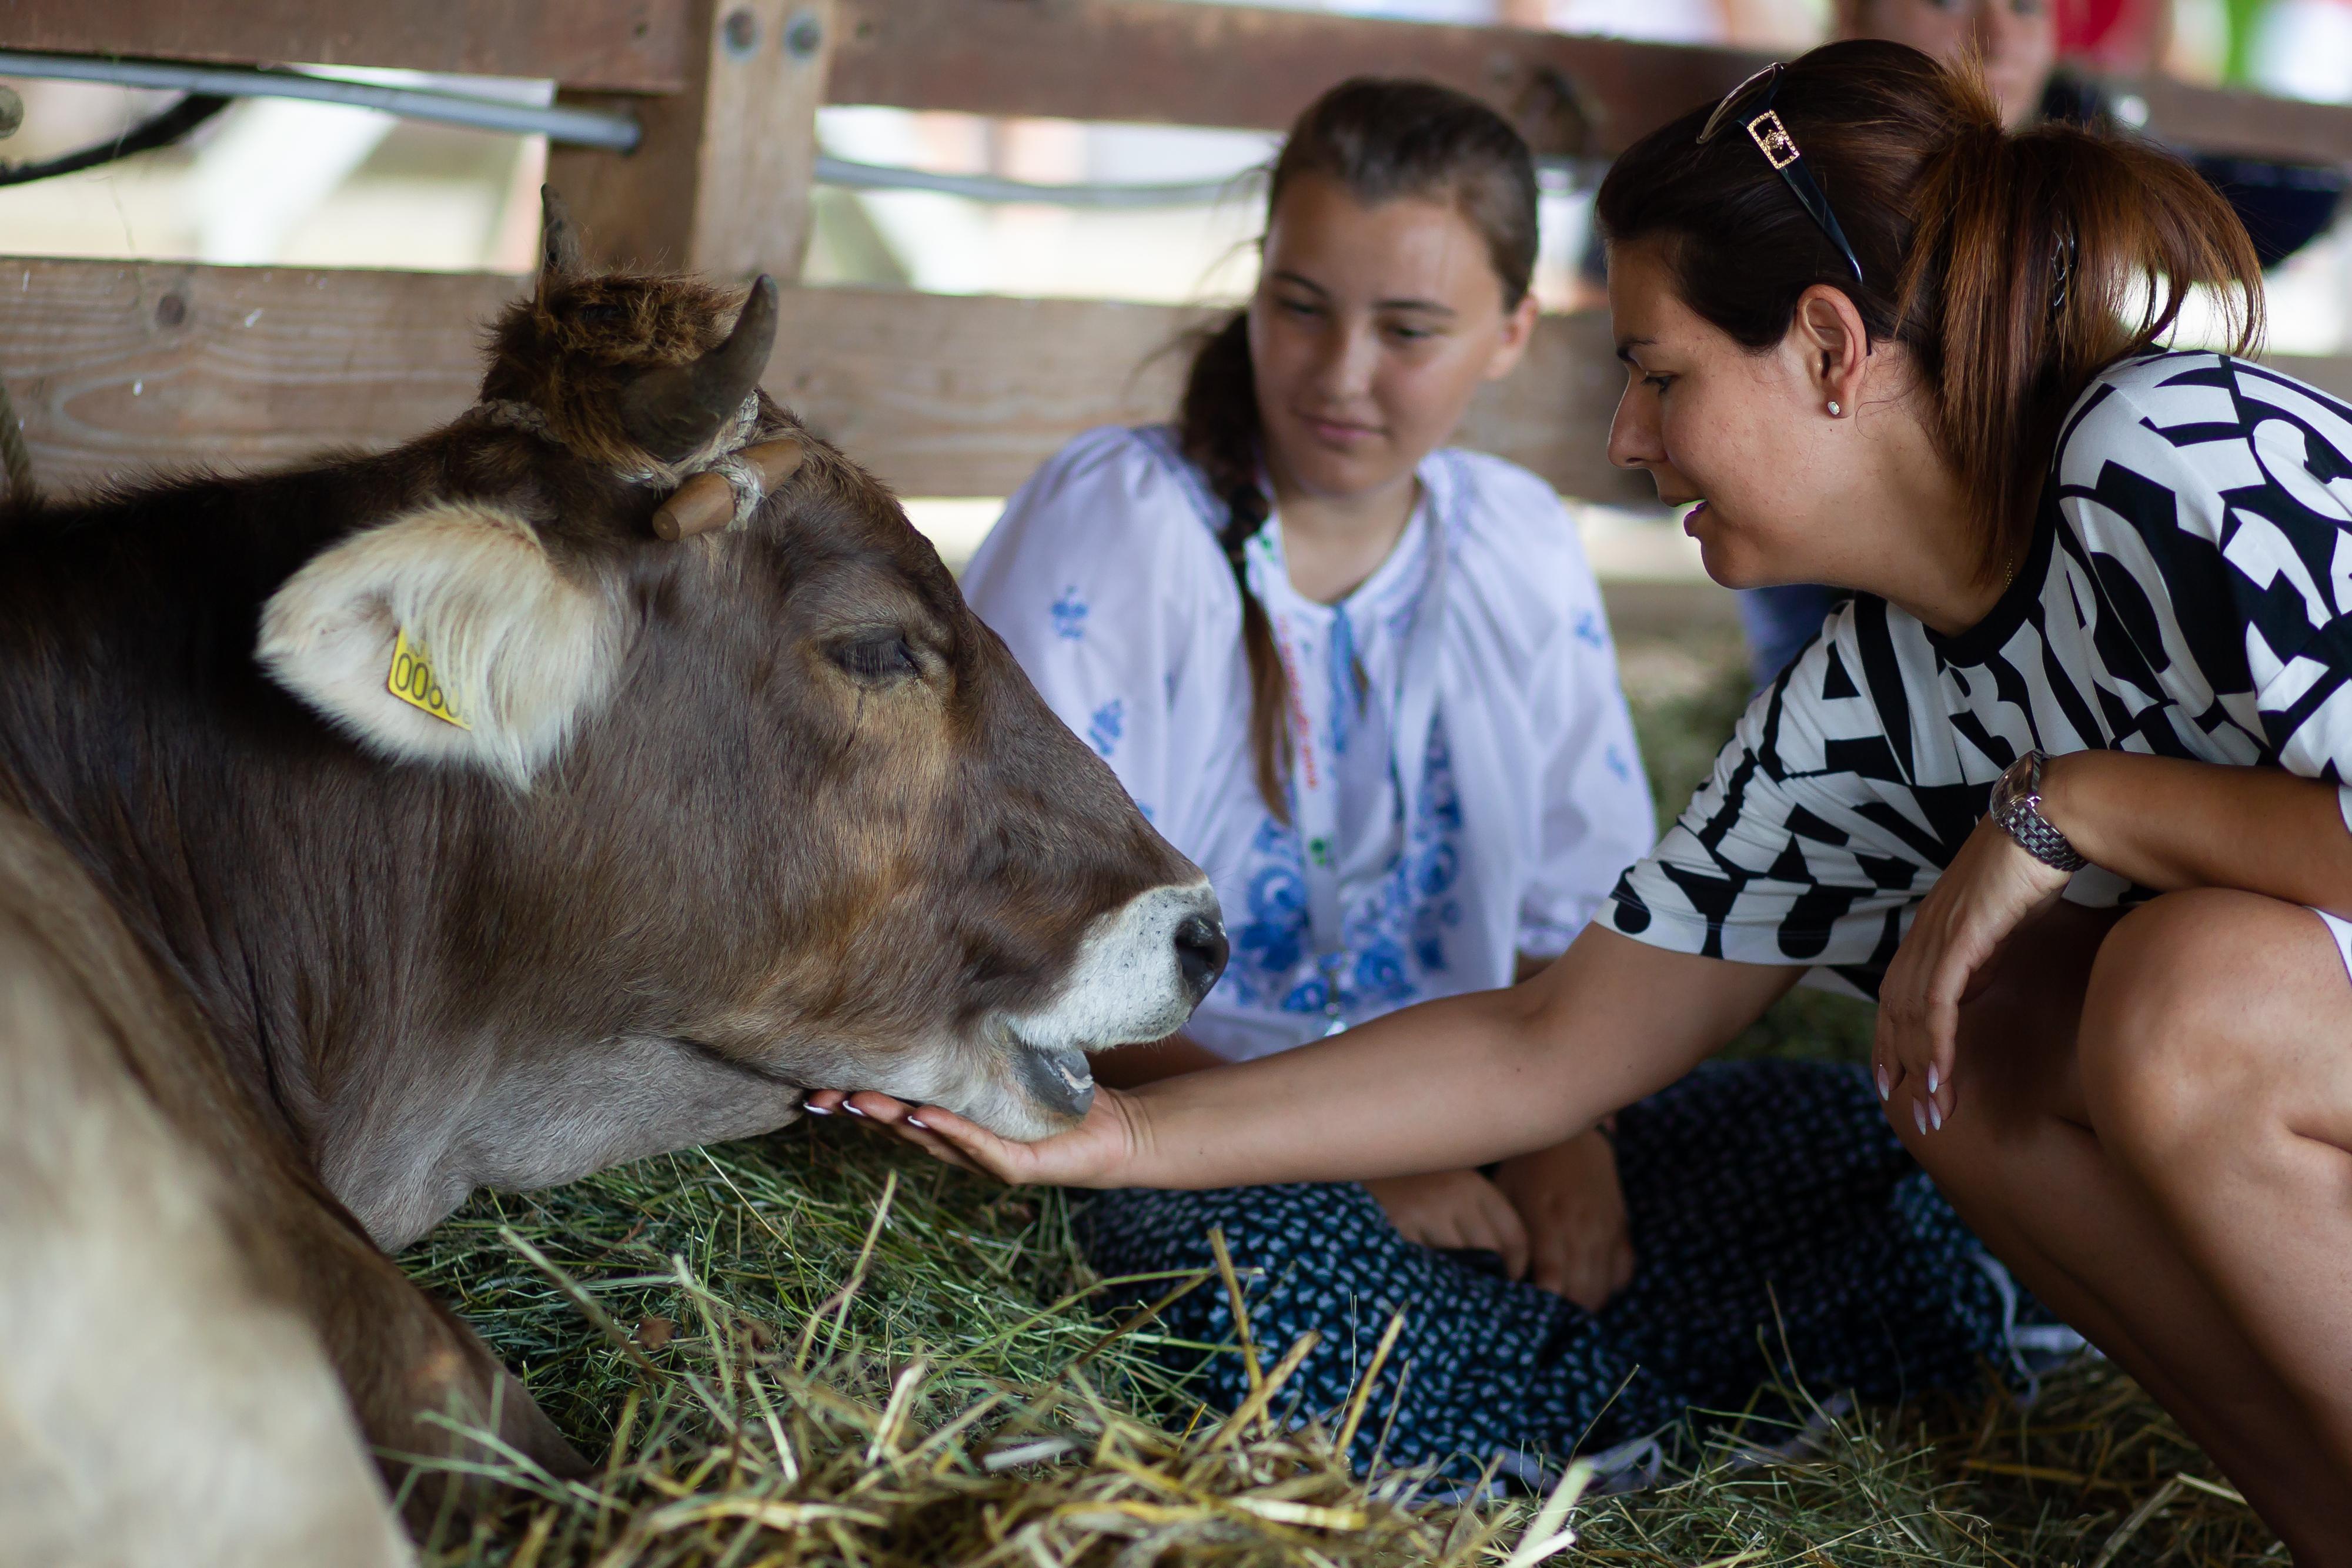 30 éves jubileumát ünnepli a Farmer Expo